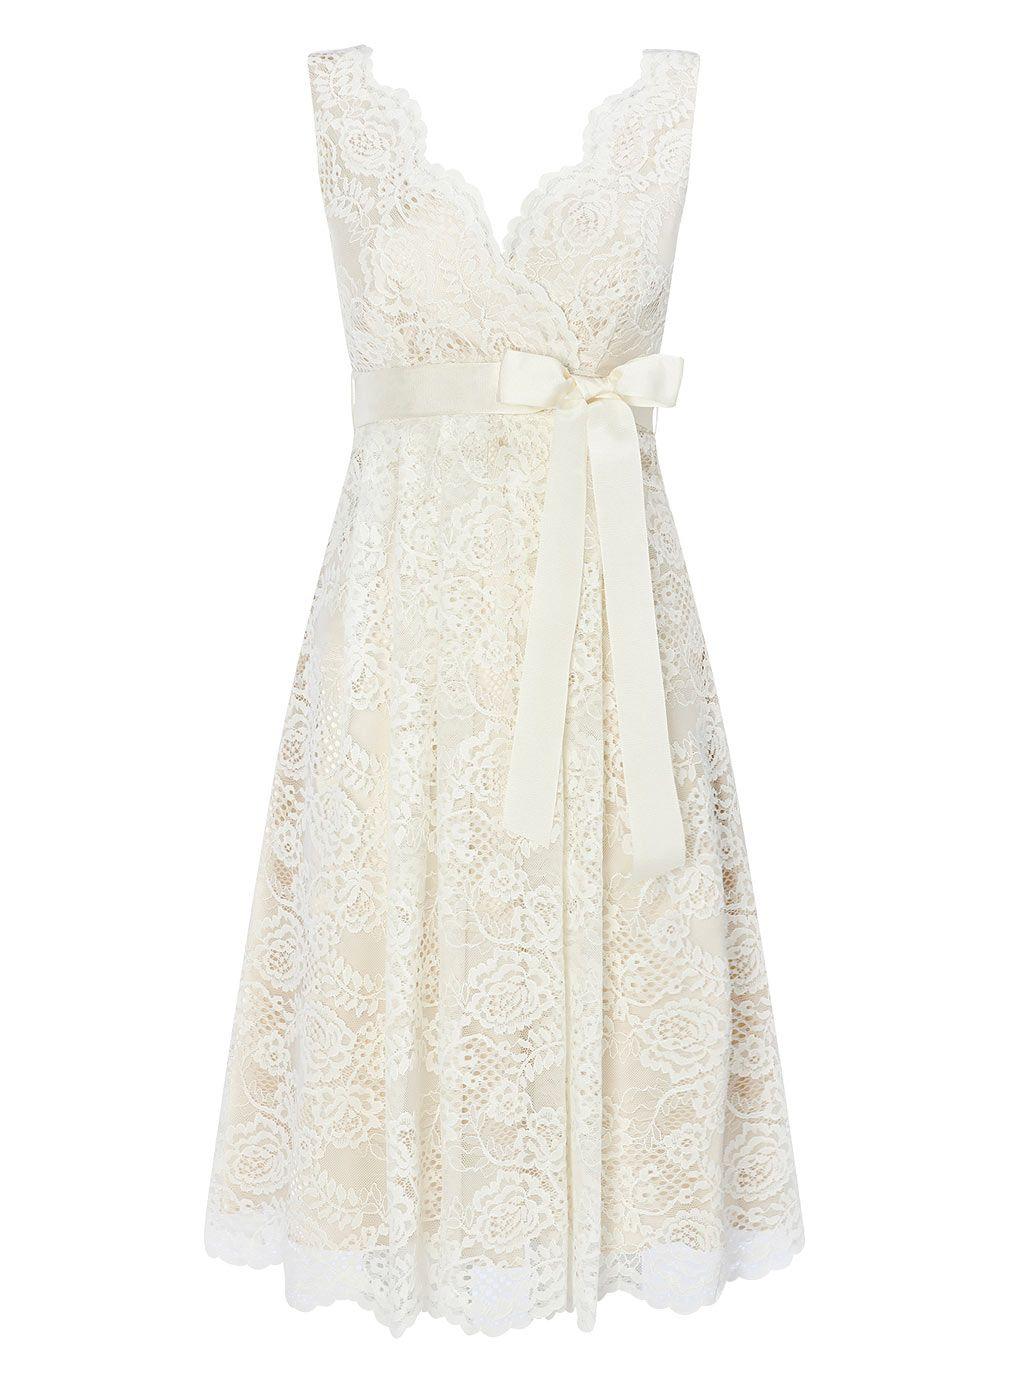 Sofia short wedding dress bhs i love this dress for a reception